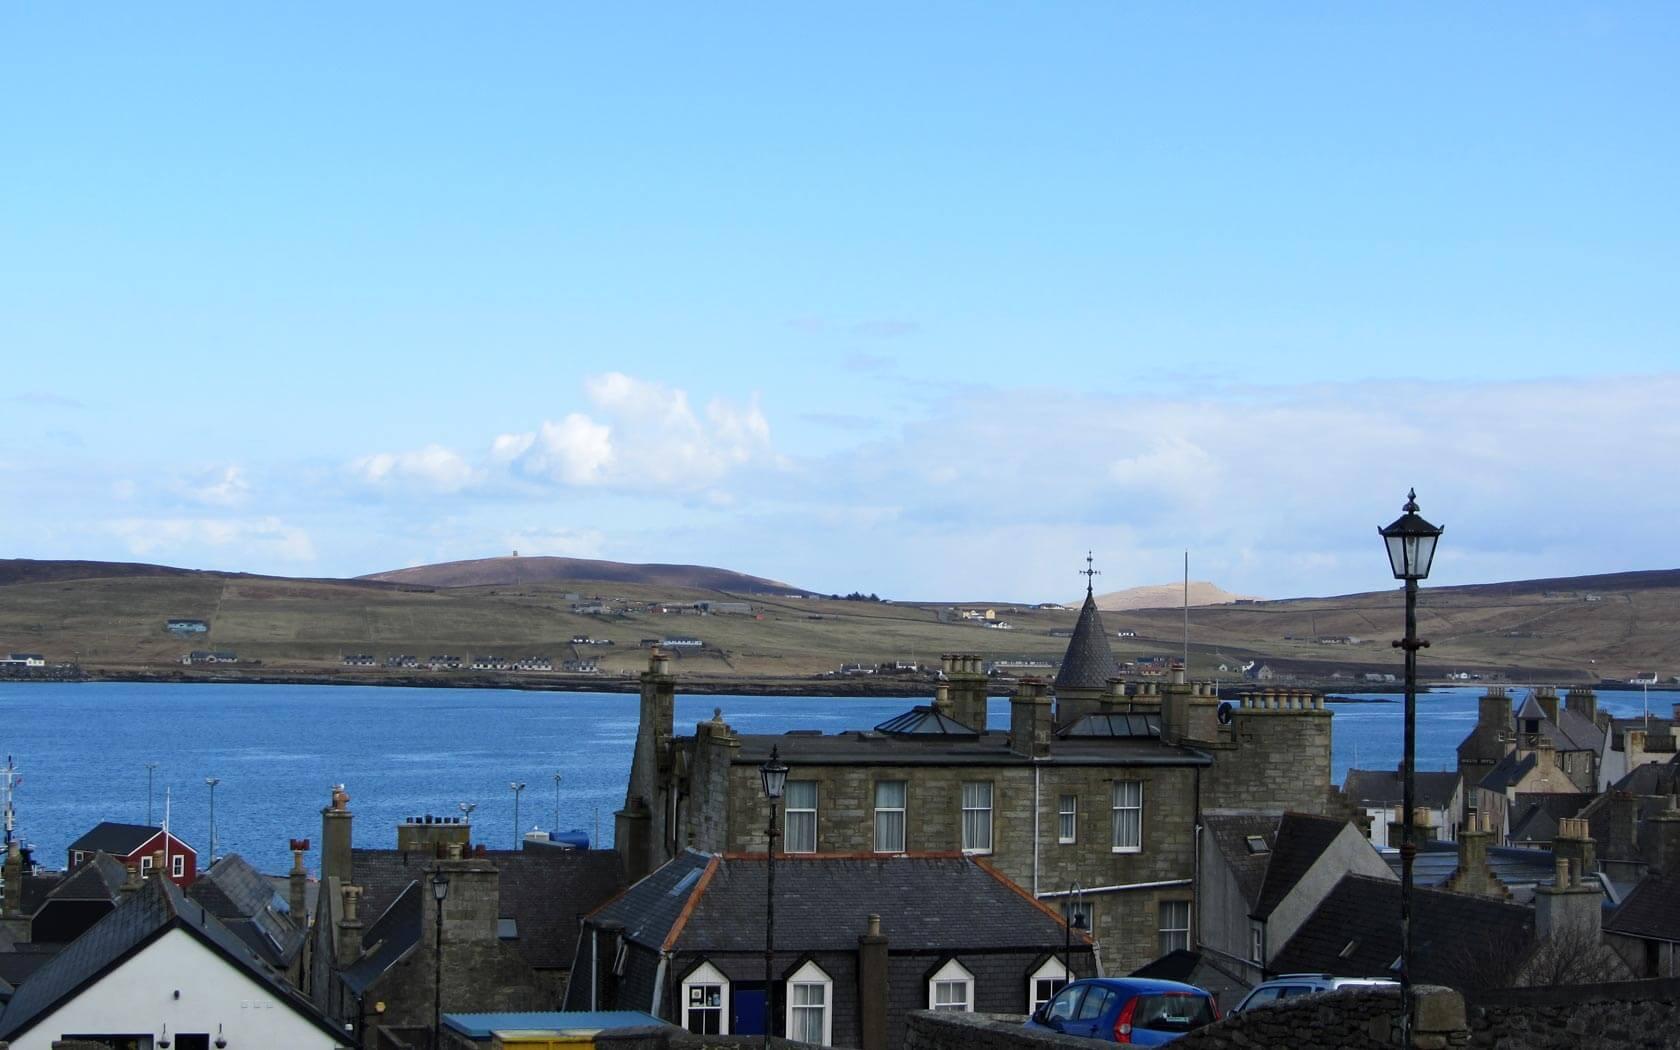 Shetland Reisebericht: Ausblick auf Lerwick